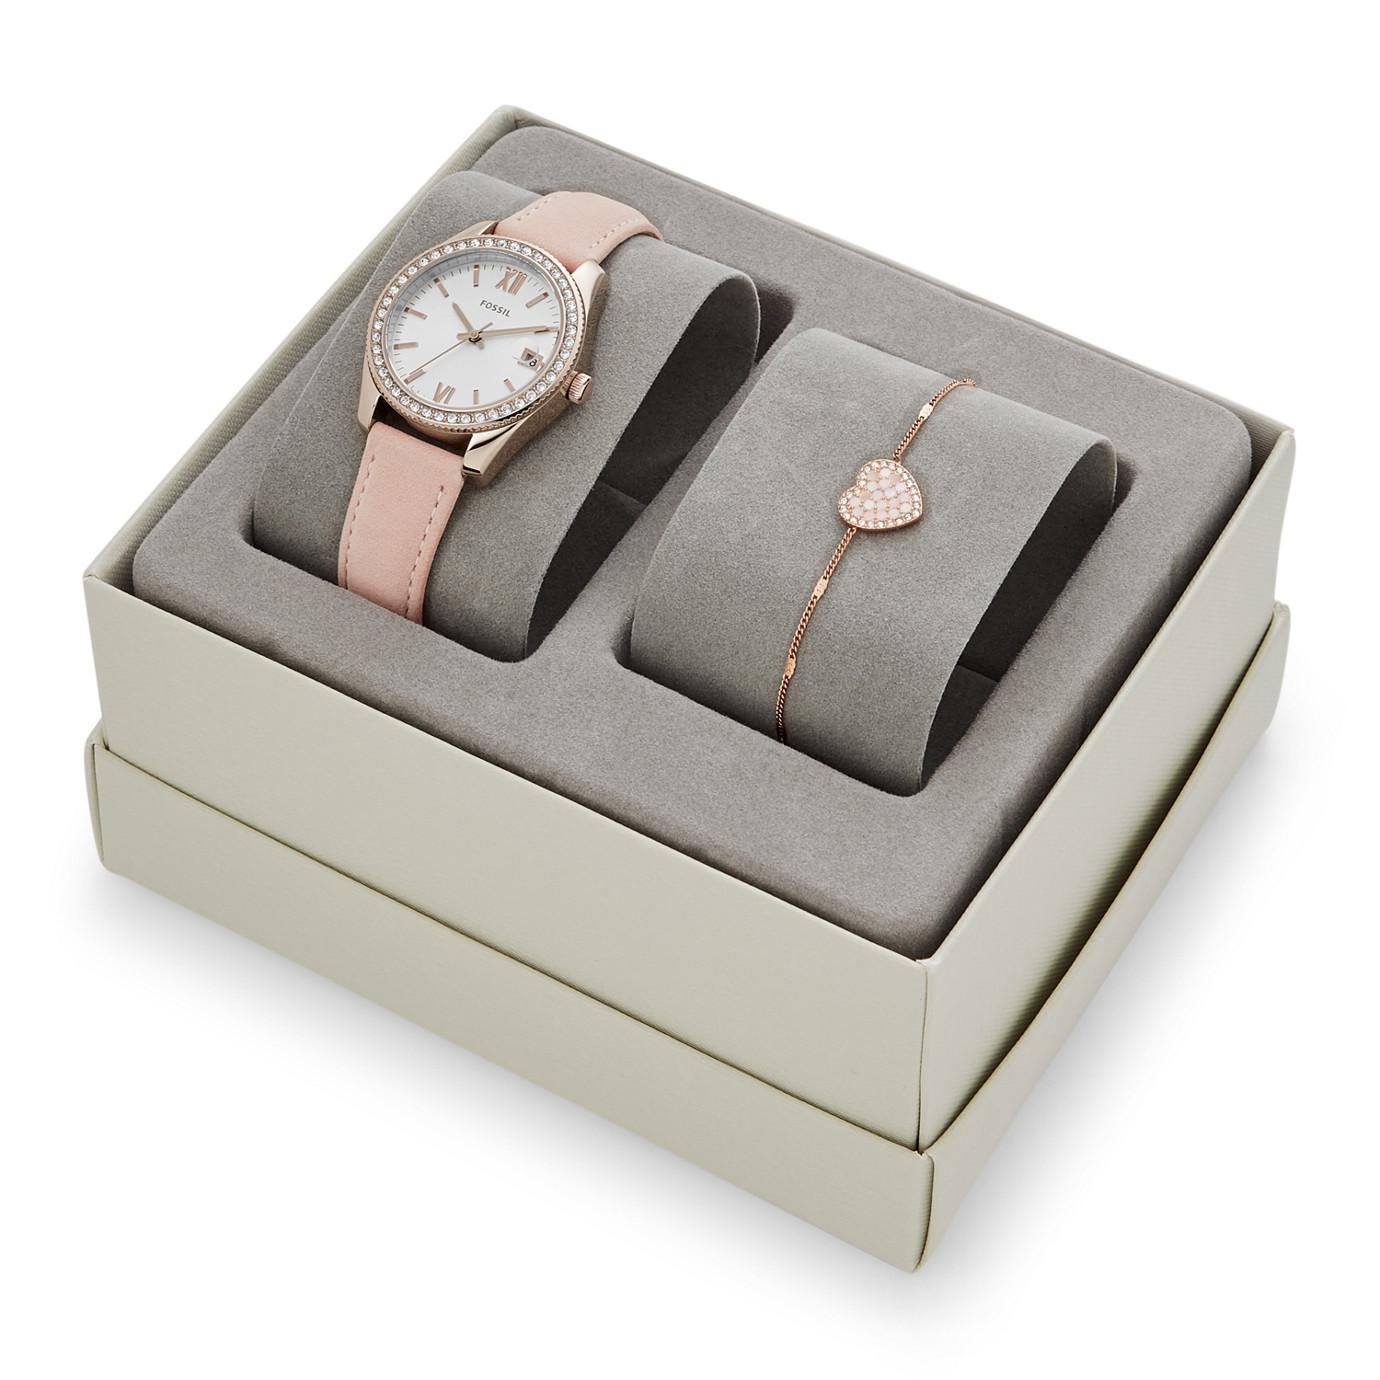 Scarlette Mini Three-Hand Date Blush Leather Watch and Bracelet Box Set